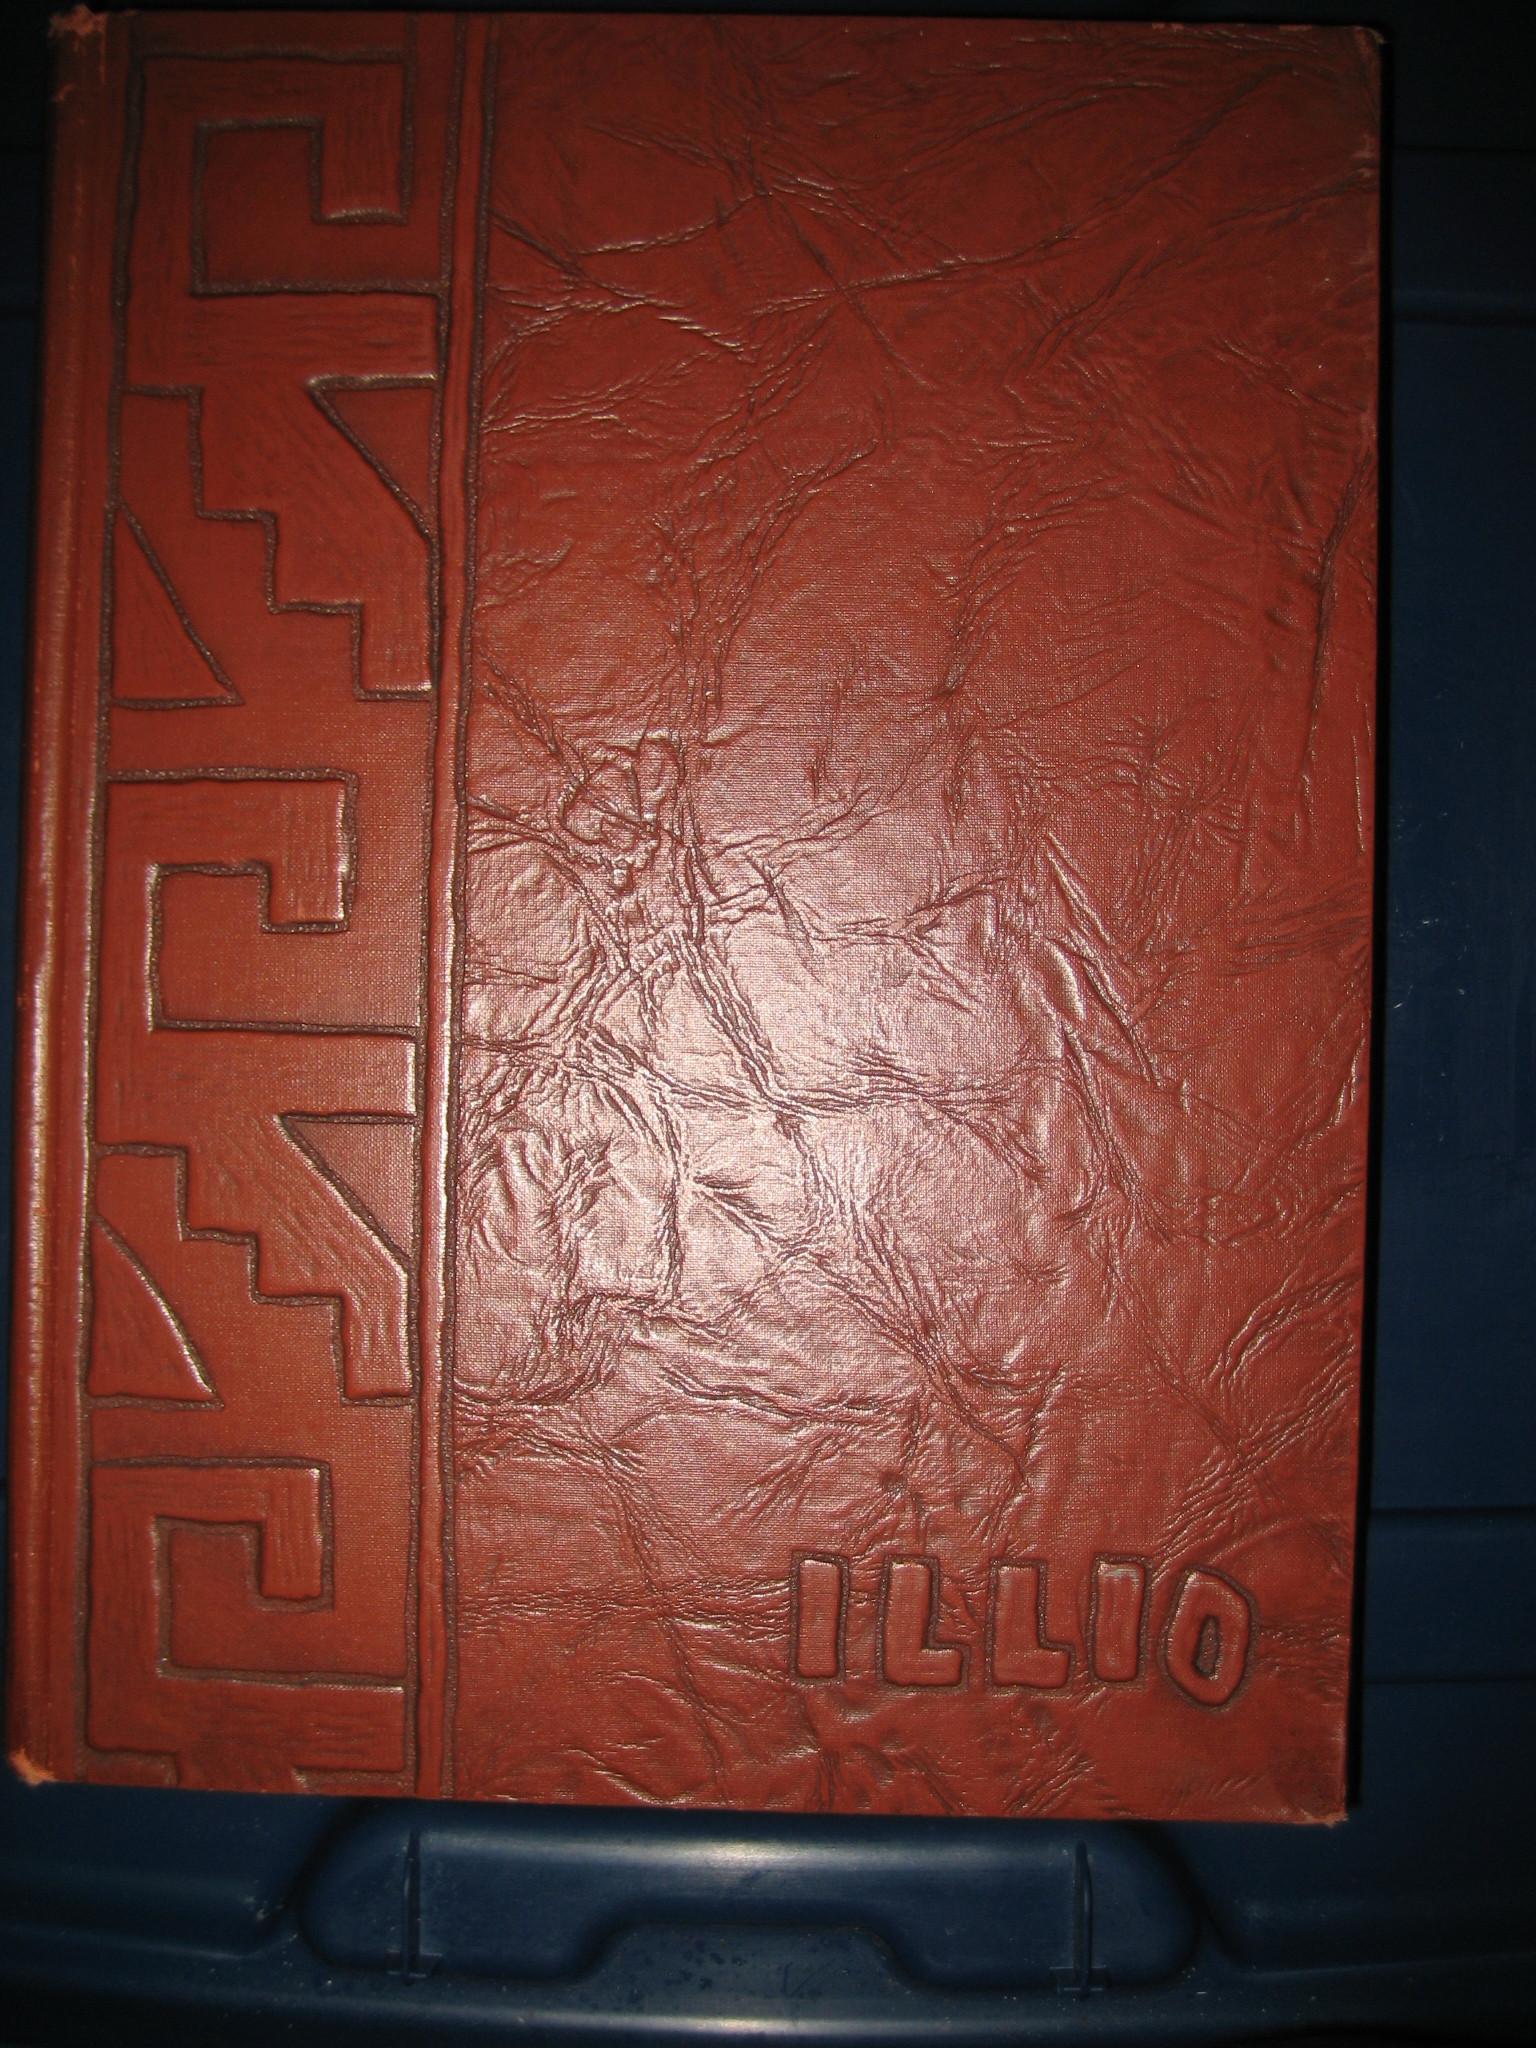 University of Illinois Year Book 1949 Hugh Hefner